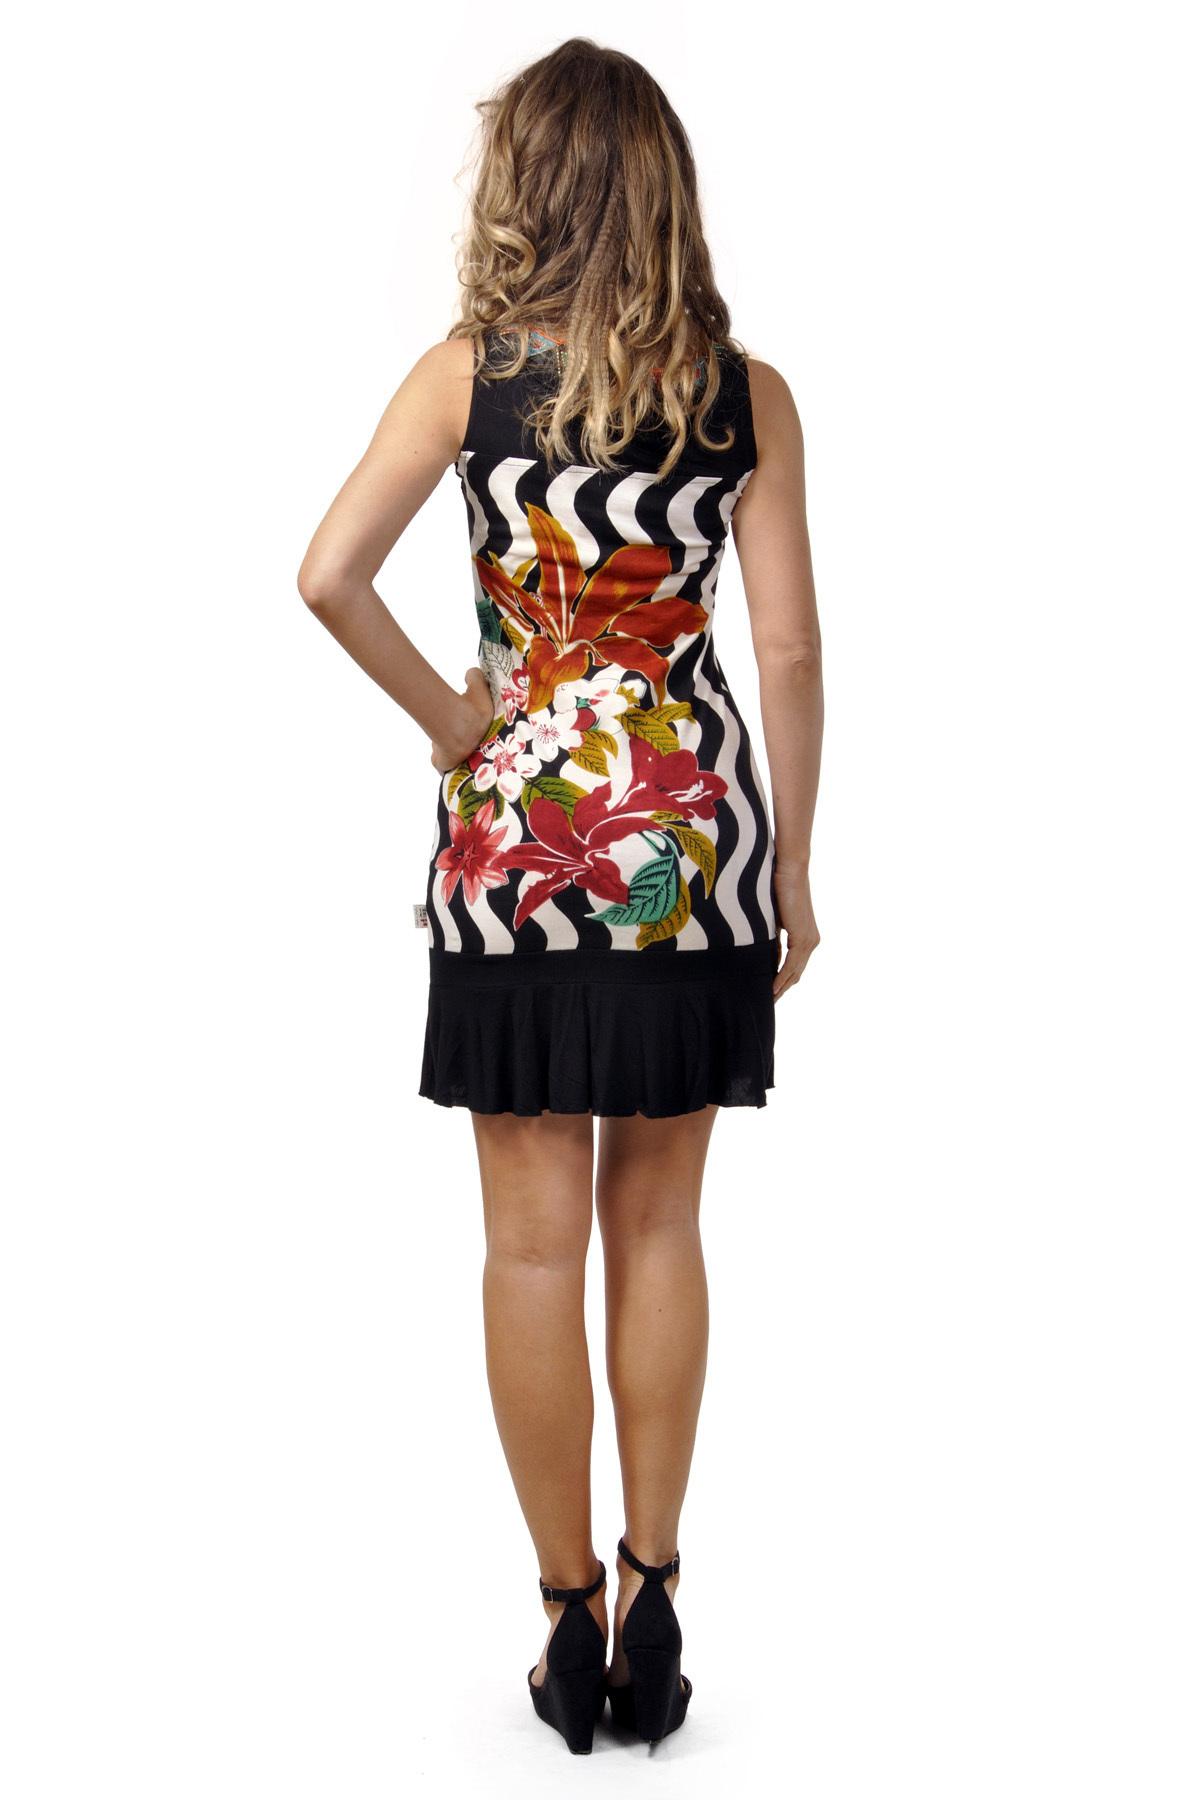 Savage Culture: Hawaiian Hibiscus Sleeveless Judith Dress (Almost Gone!)